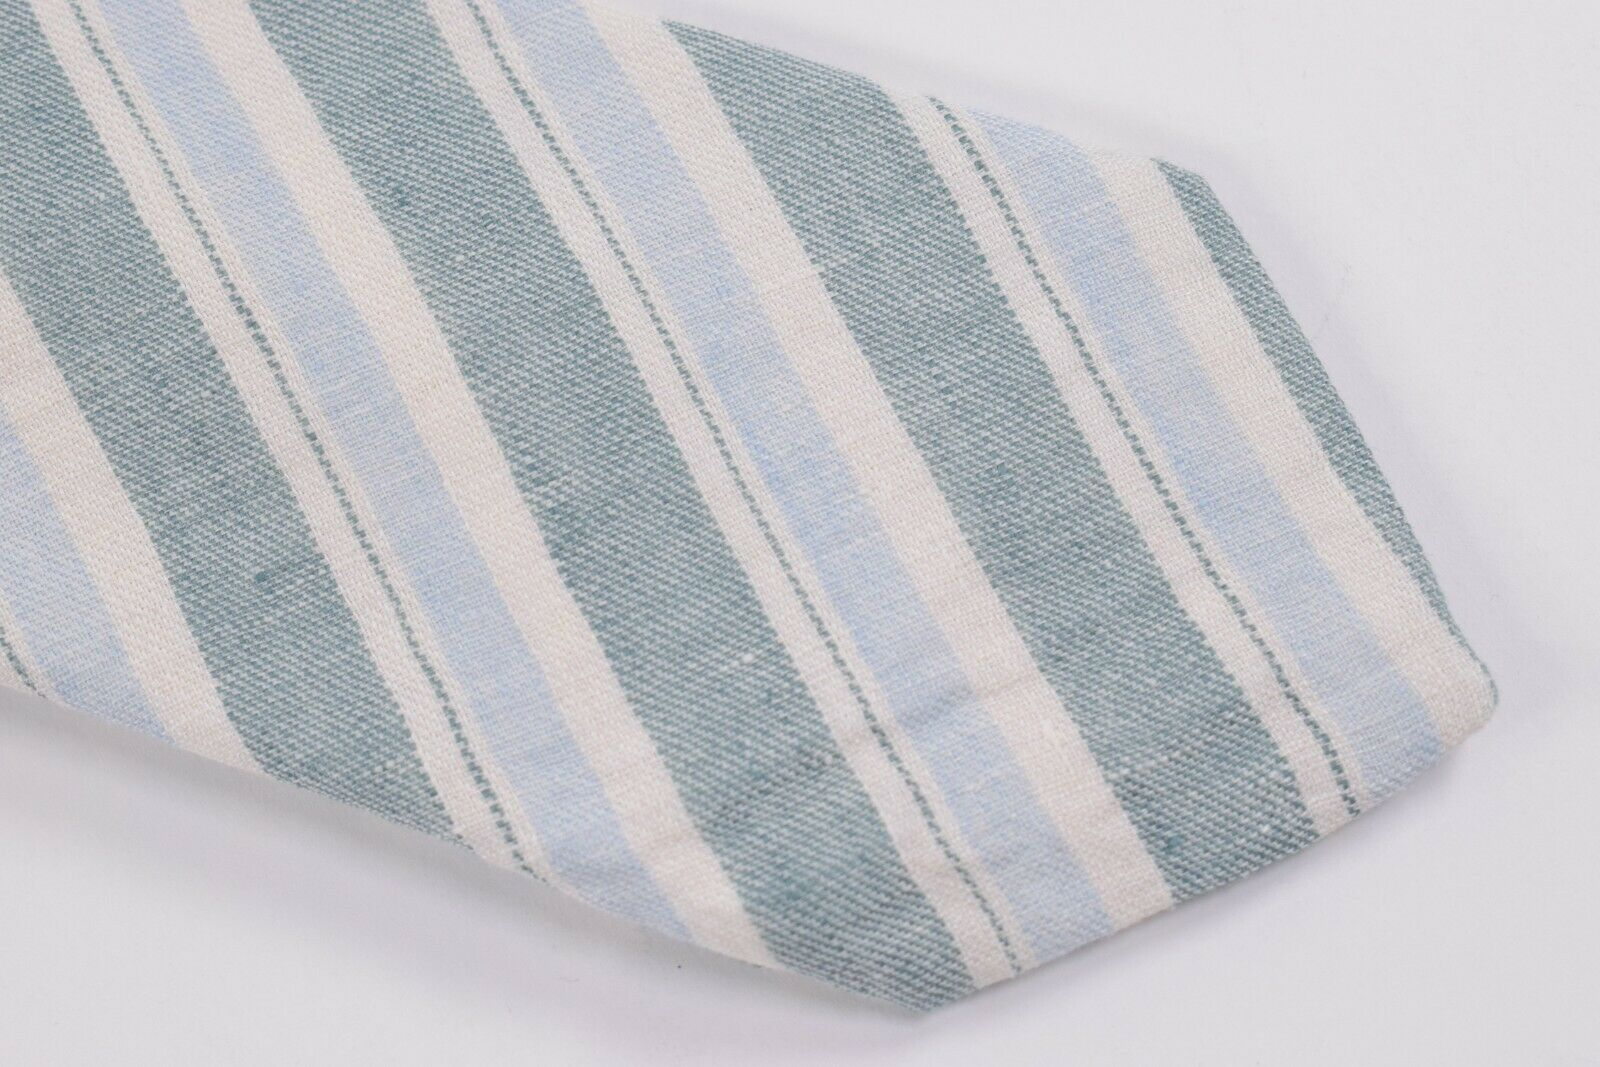 Belvest Neck Tie NWT Blue, White and Light Blue Striped 100% Linen